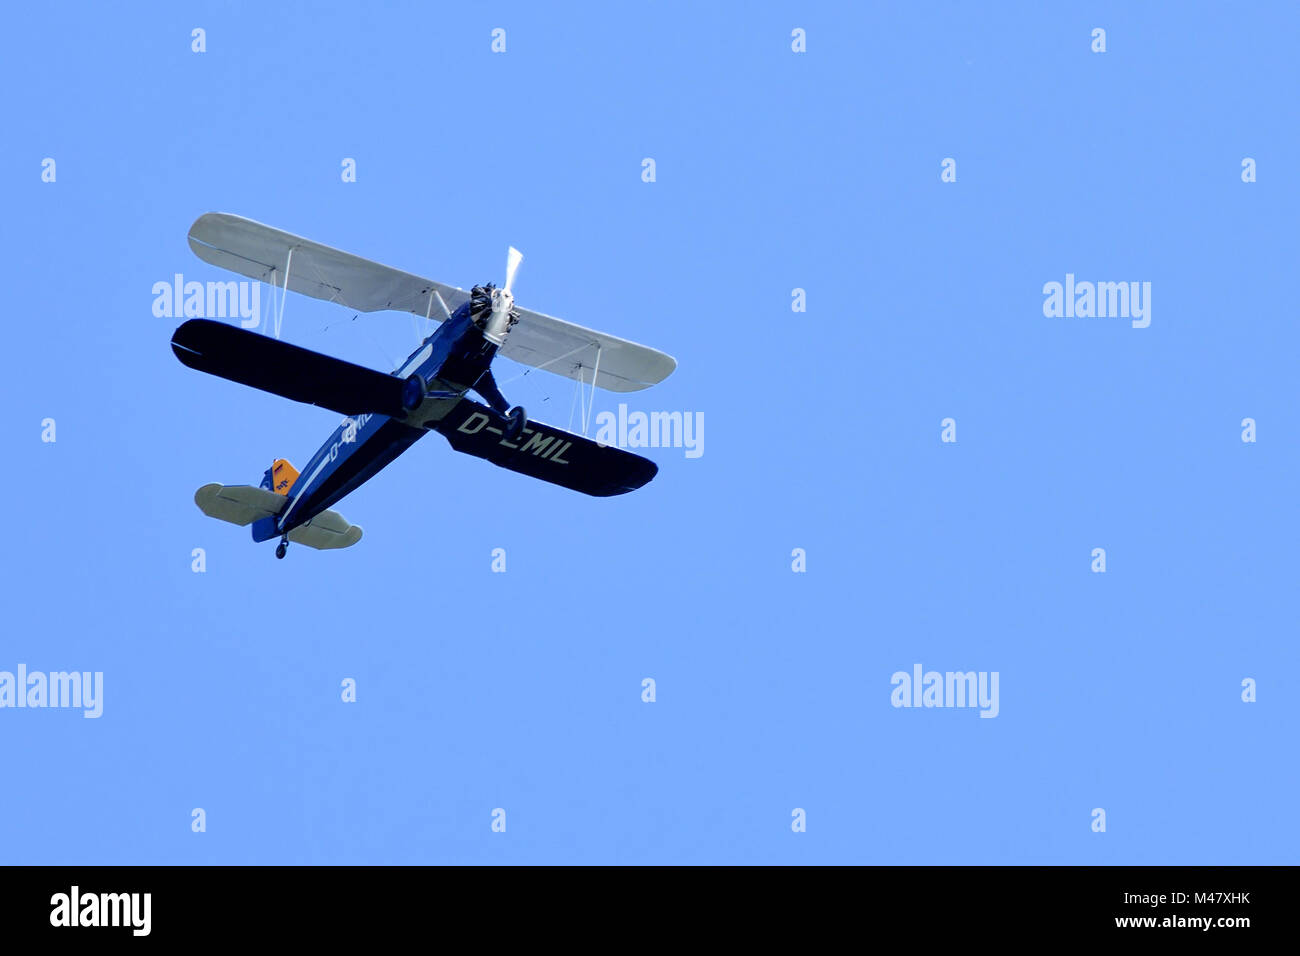 Focke-wulf fw 44 - Stock Image